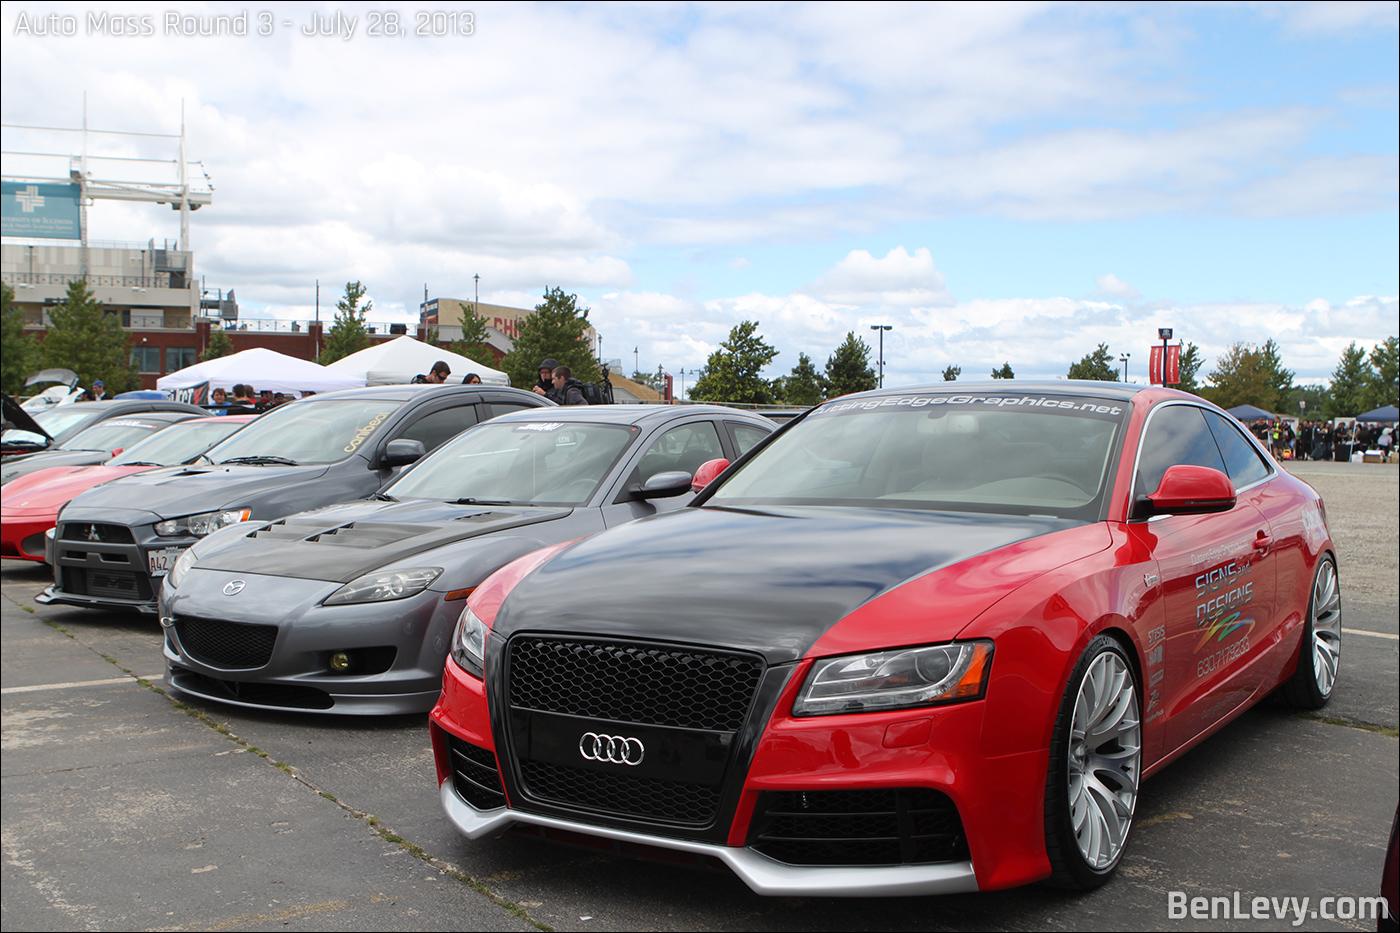 Show Cars at Auto Mass Round 3